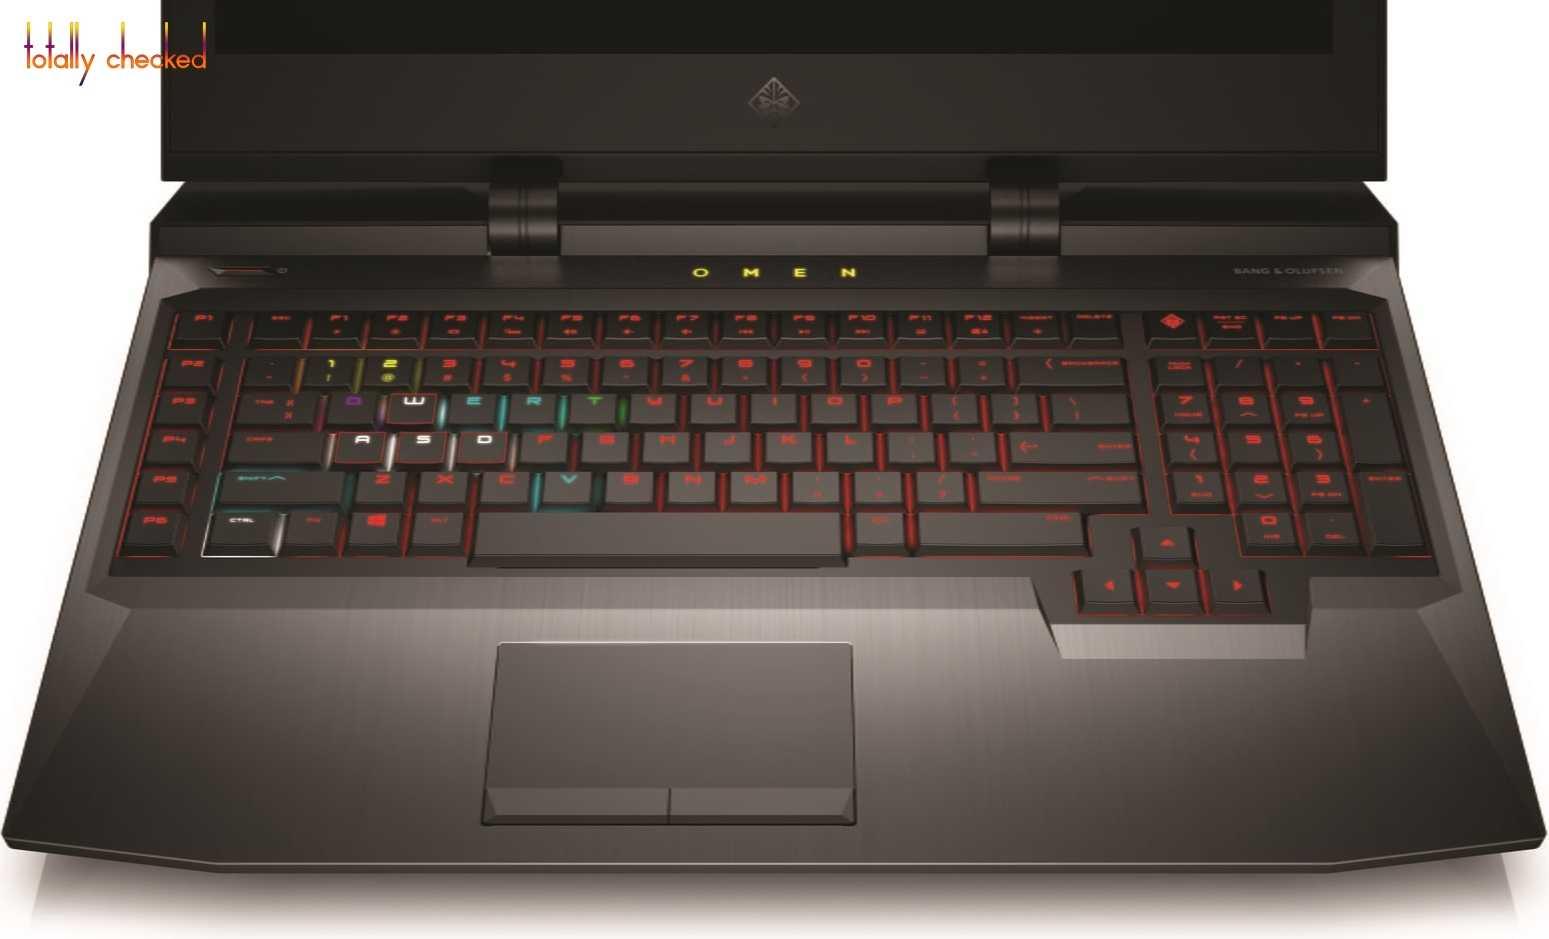 Keyboards4Laptops French Layout Backlit Black Windows 8 Laptop Keyboard Compatible with HP Omen 17-an134ng HP Omen 17-an135nf HP Omen 17-an135ng HP Omen 17-an134TX HP Omen 17-an134ur